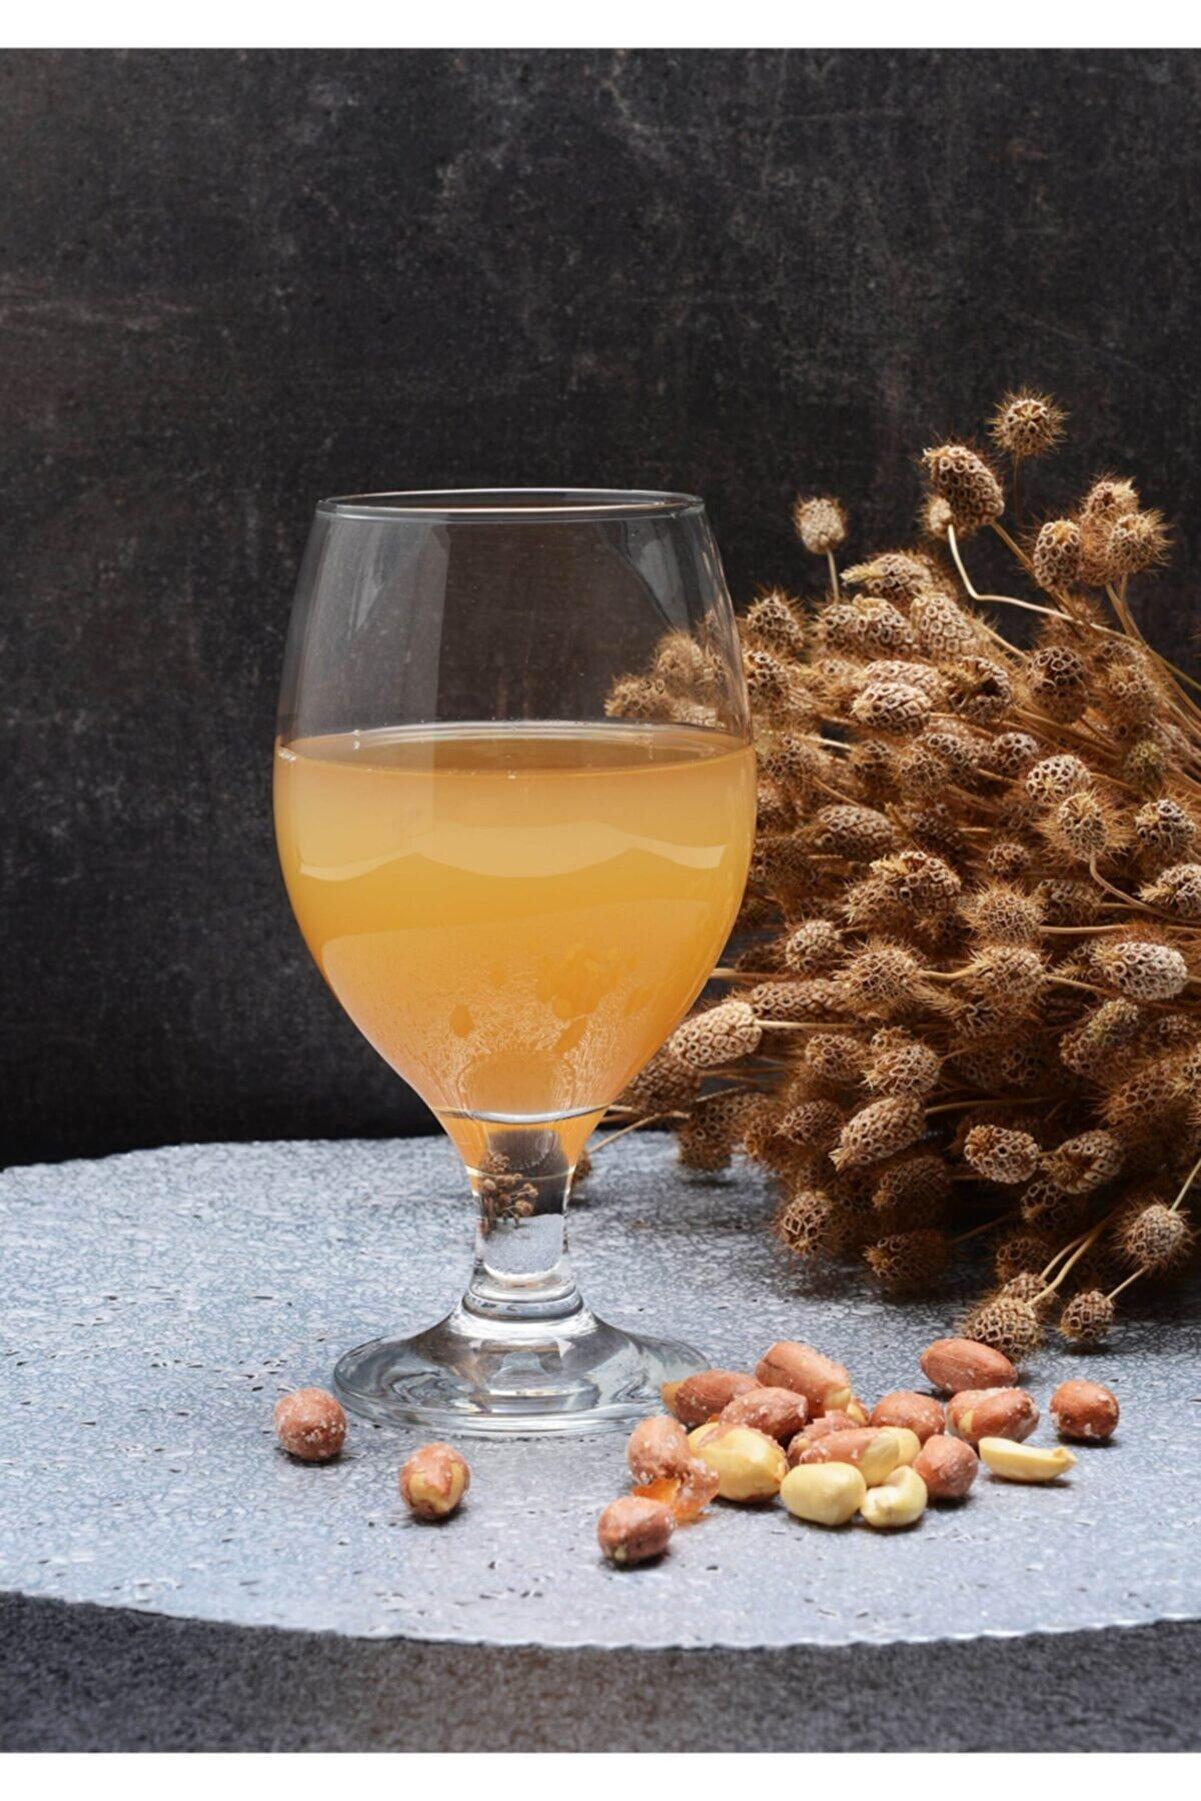 WONDERFULLL AMAZİNG Paşabahçe Mrgrup 6 قطعة بيسترو قدم مشروب غازي زجاج مجاني SHİPPİNG